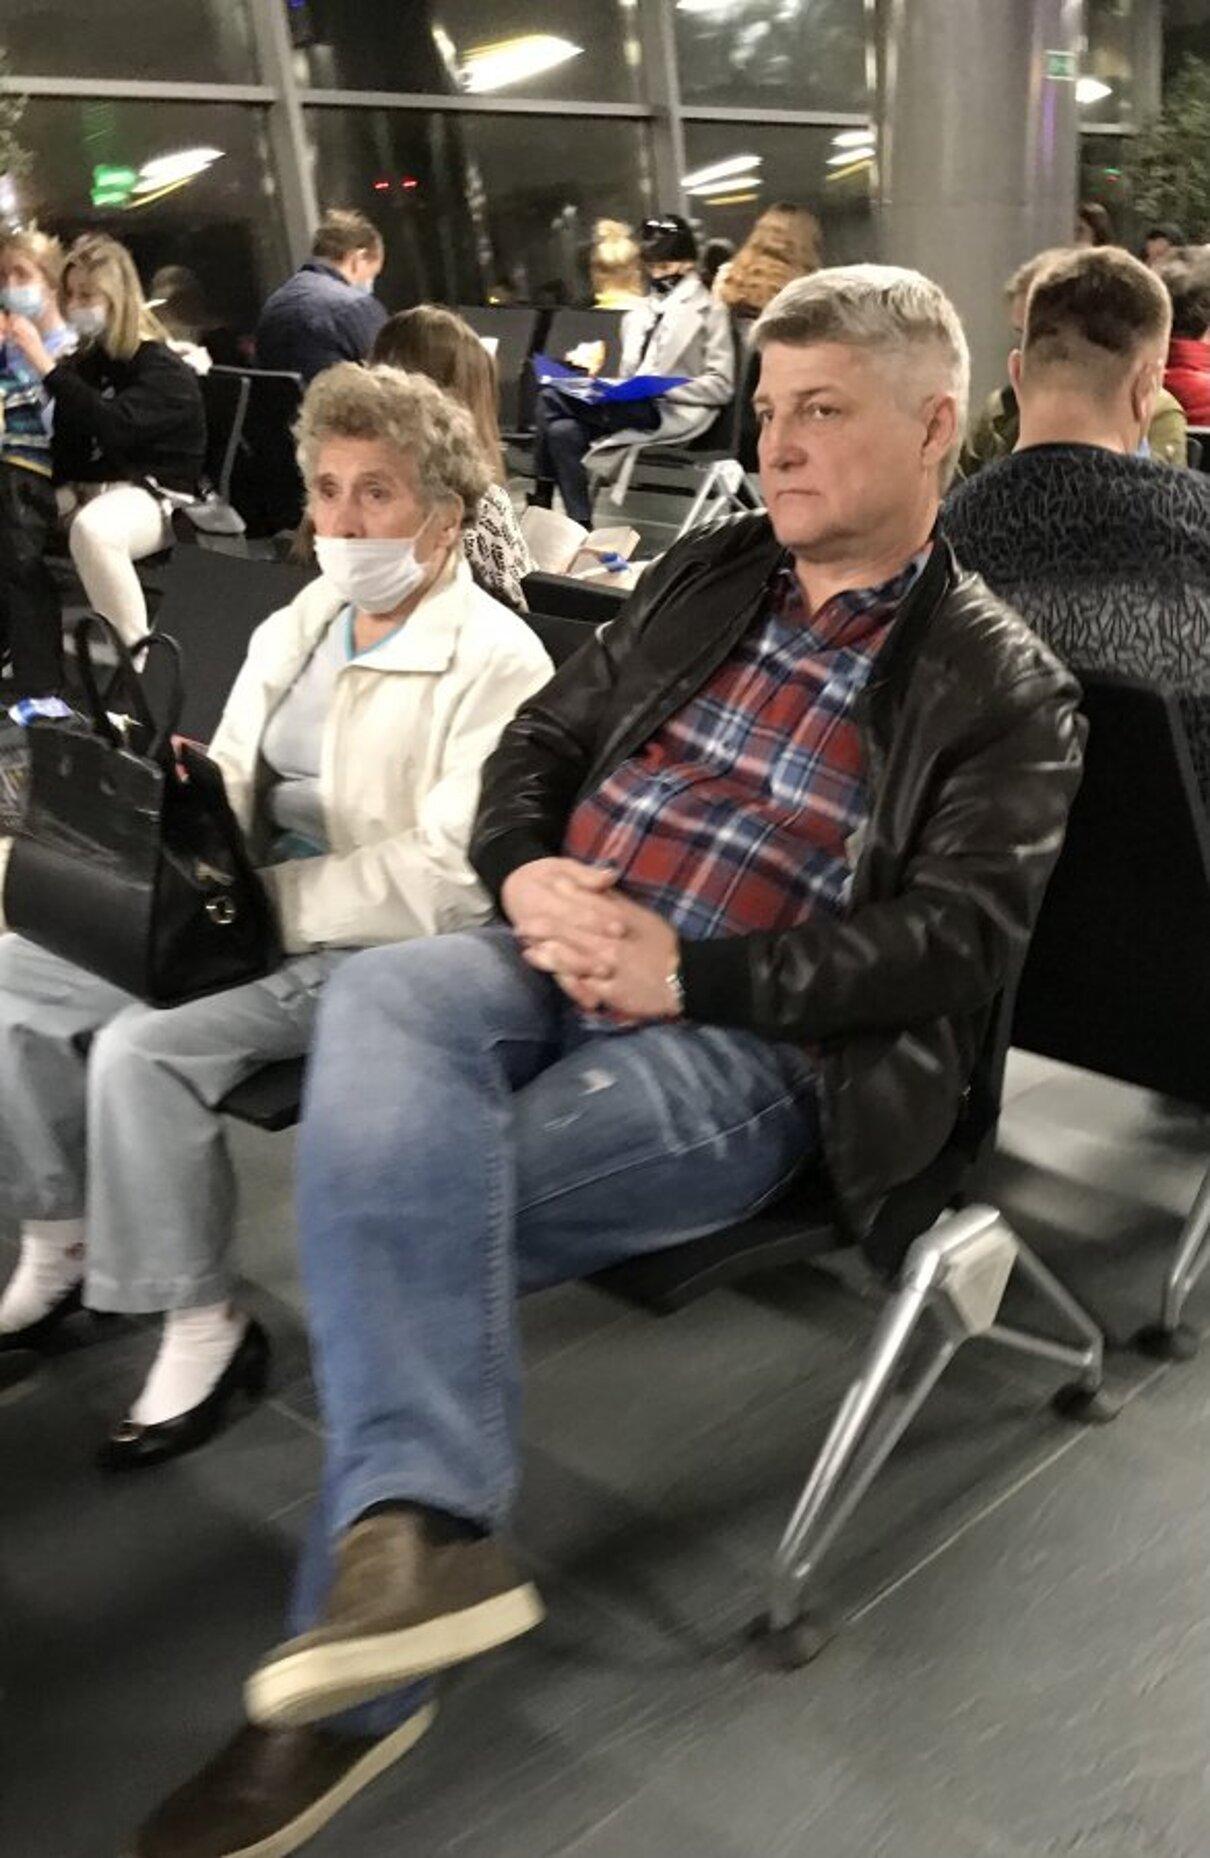 Жалоба-отзыв: Хам с аэропорта Перми 20.04.21 - Хам.  Фото №1